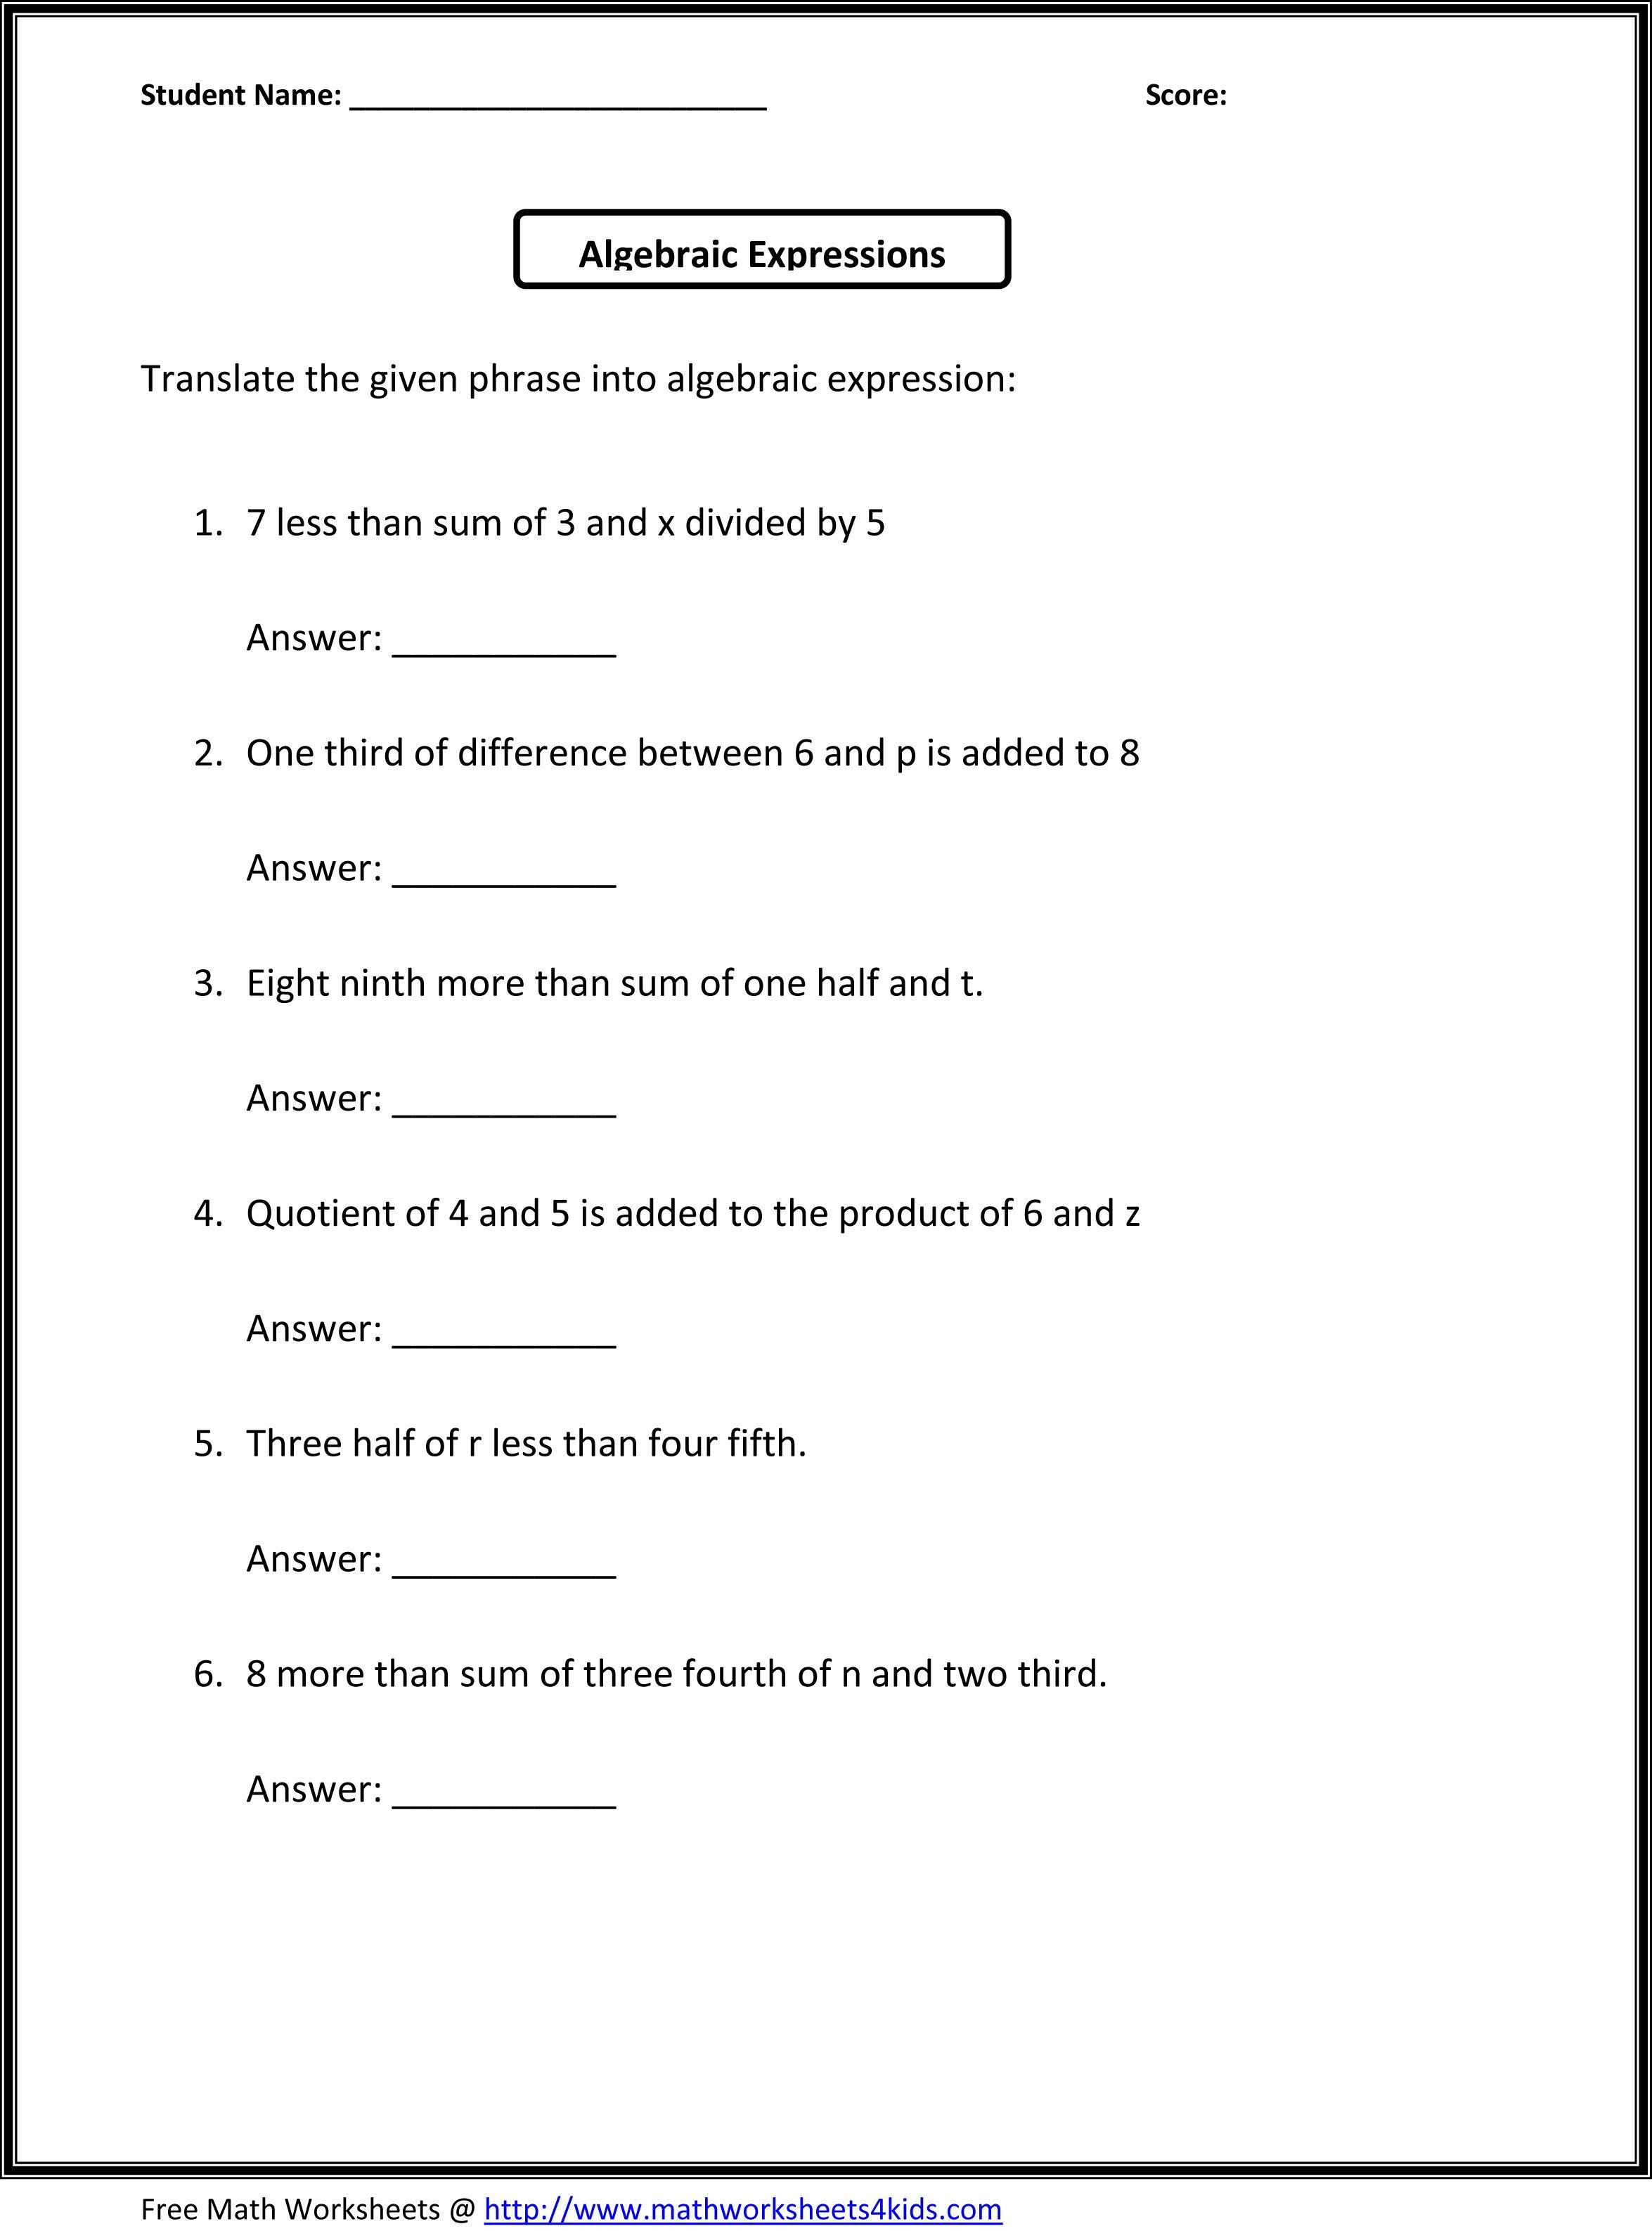 Sixth Grade Math Worksheets Includes Perimeter Area